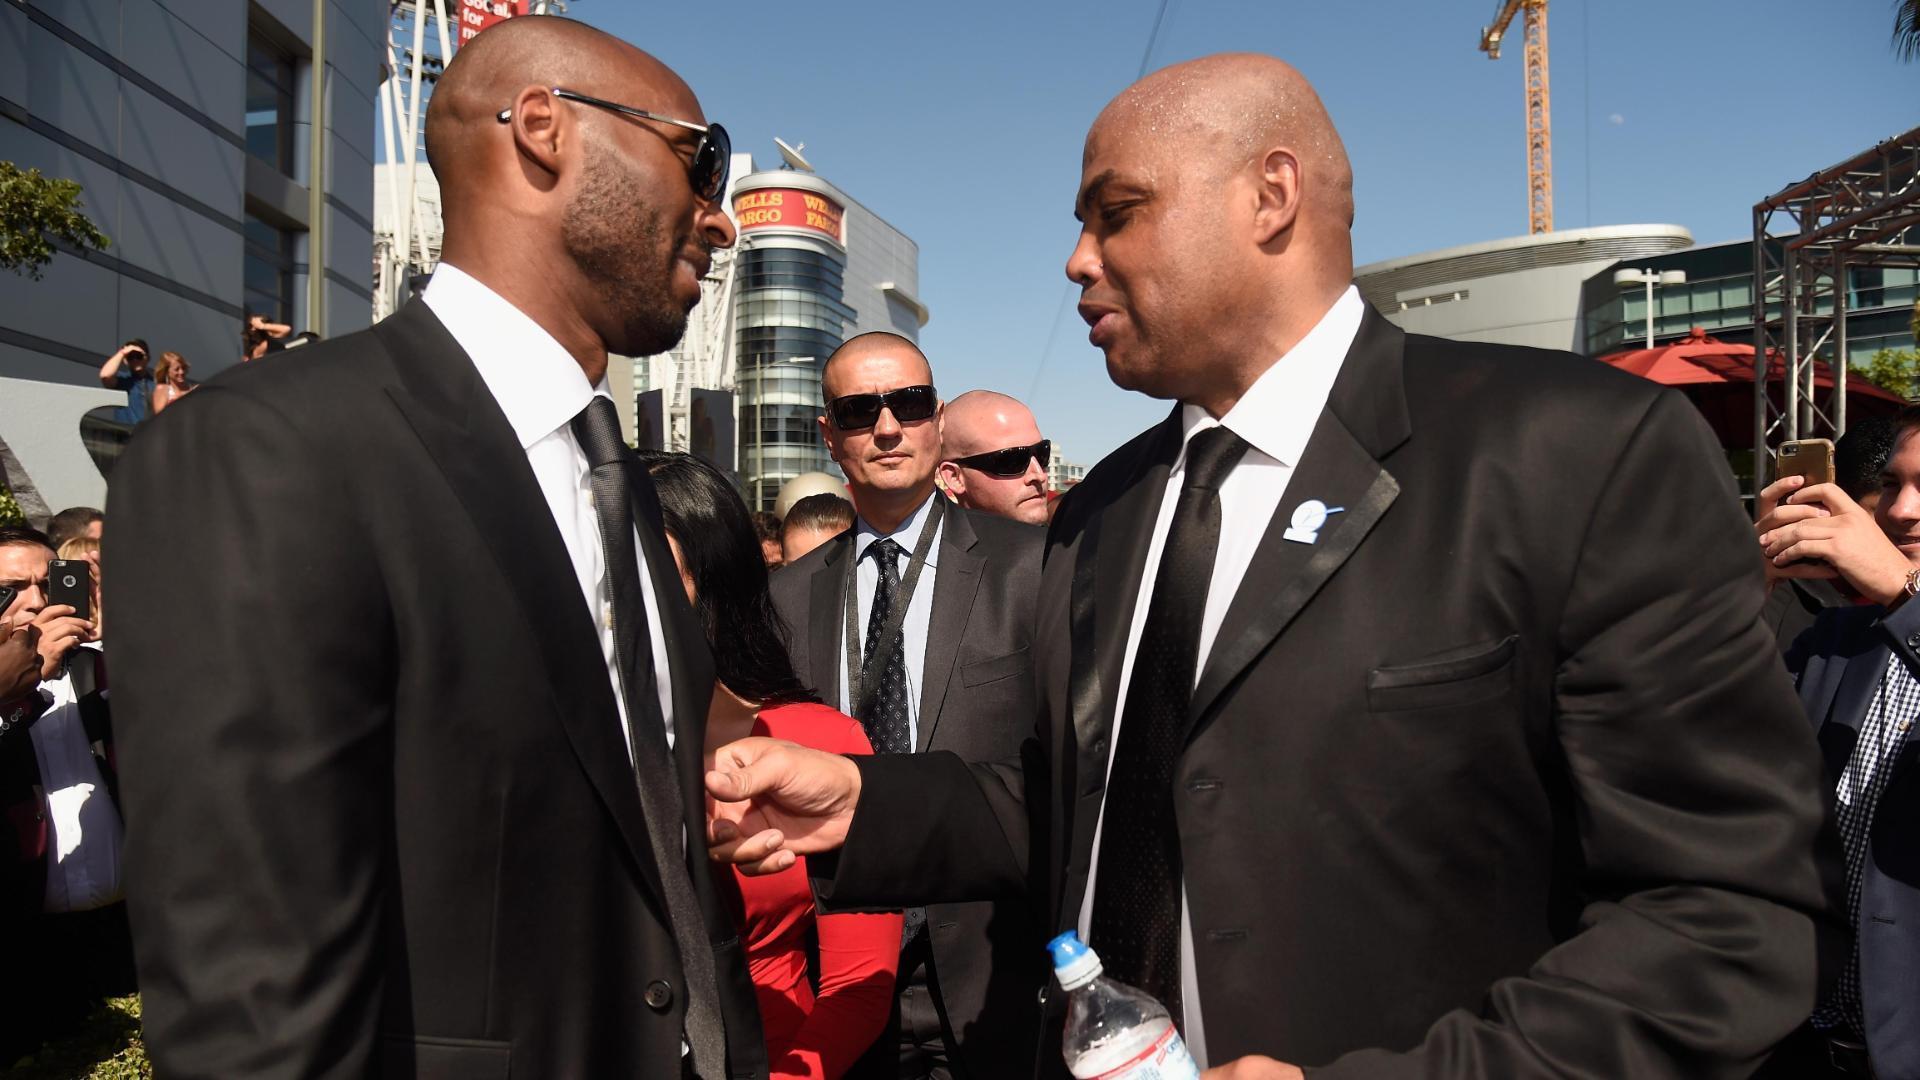 Charles Barkley calls Kobe the best player since MJ